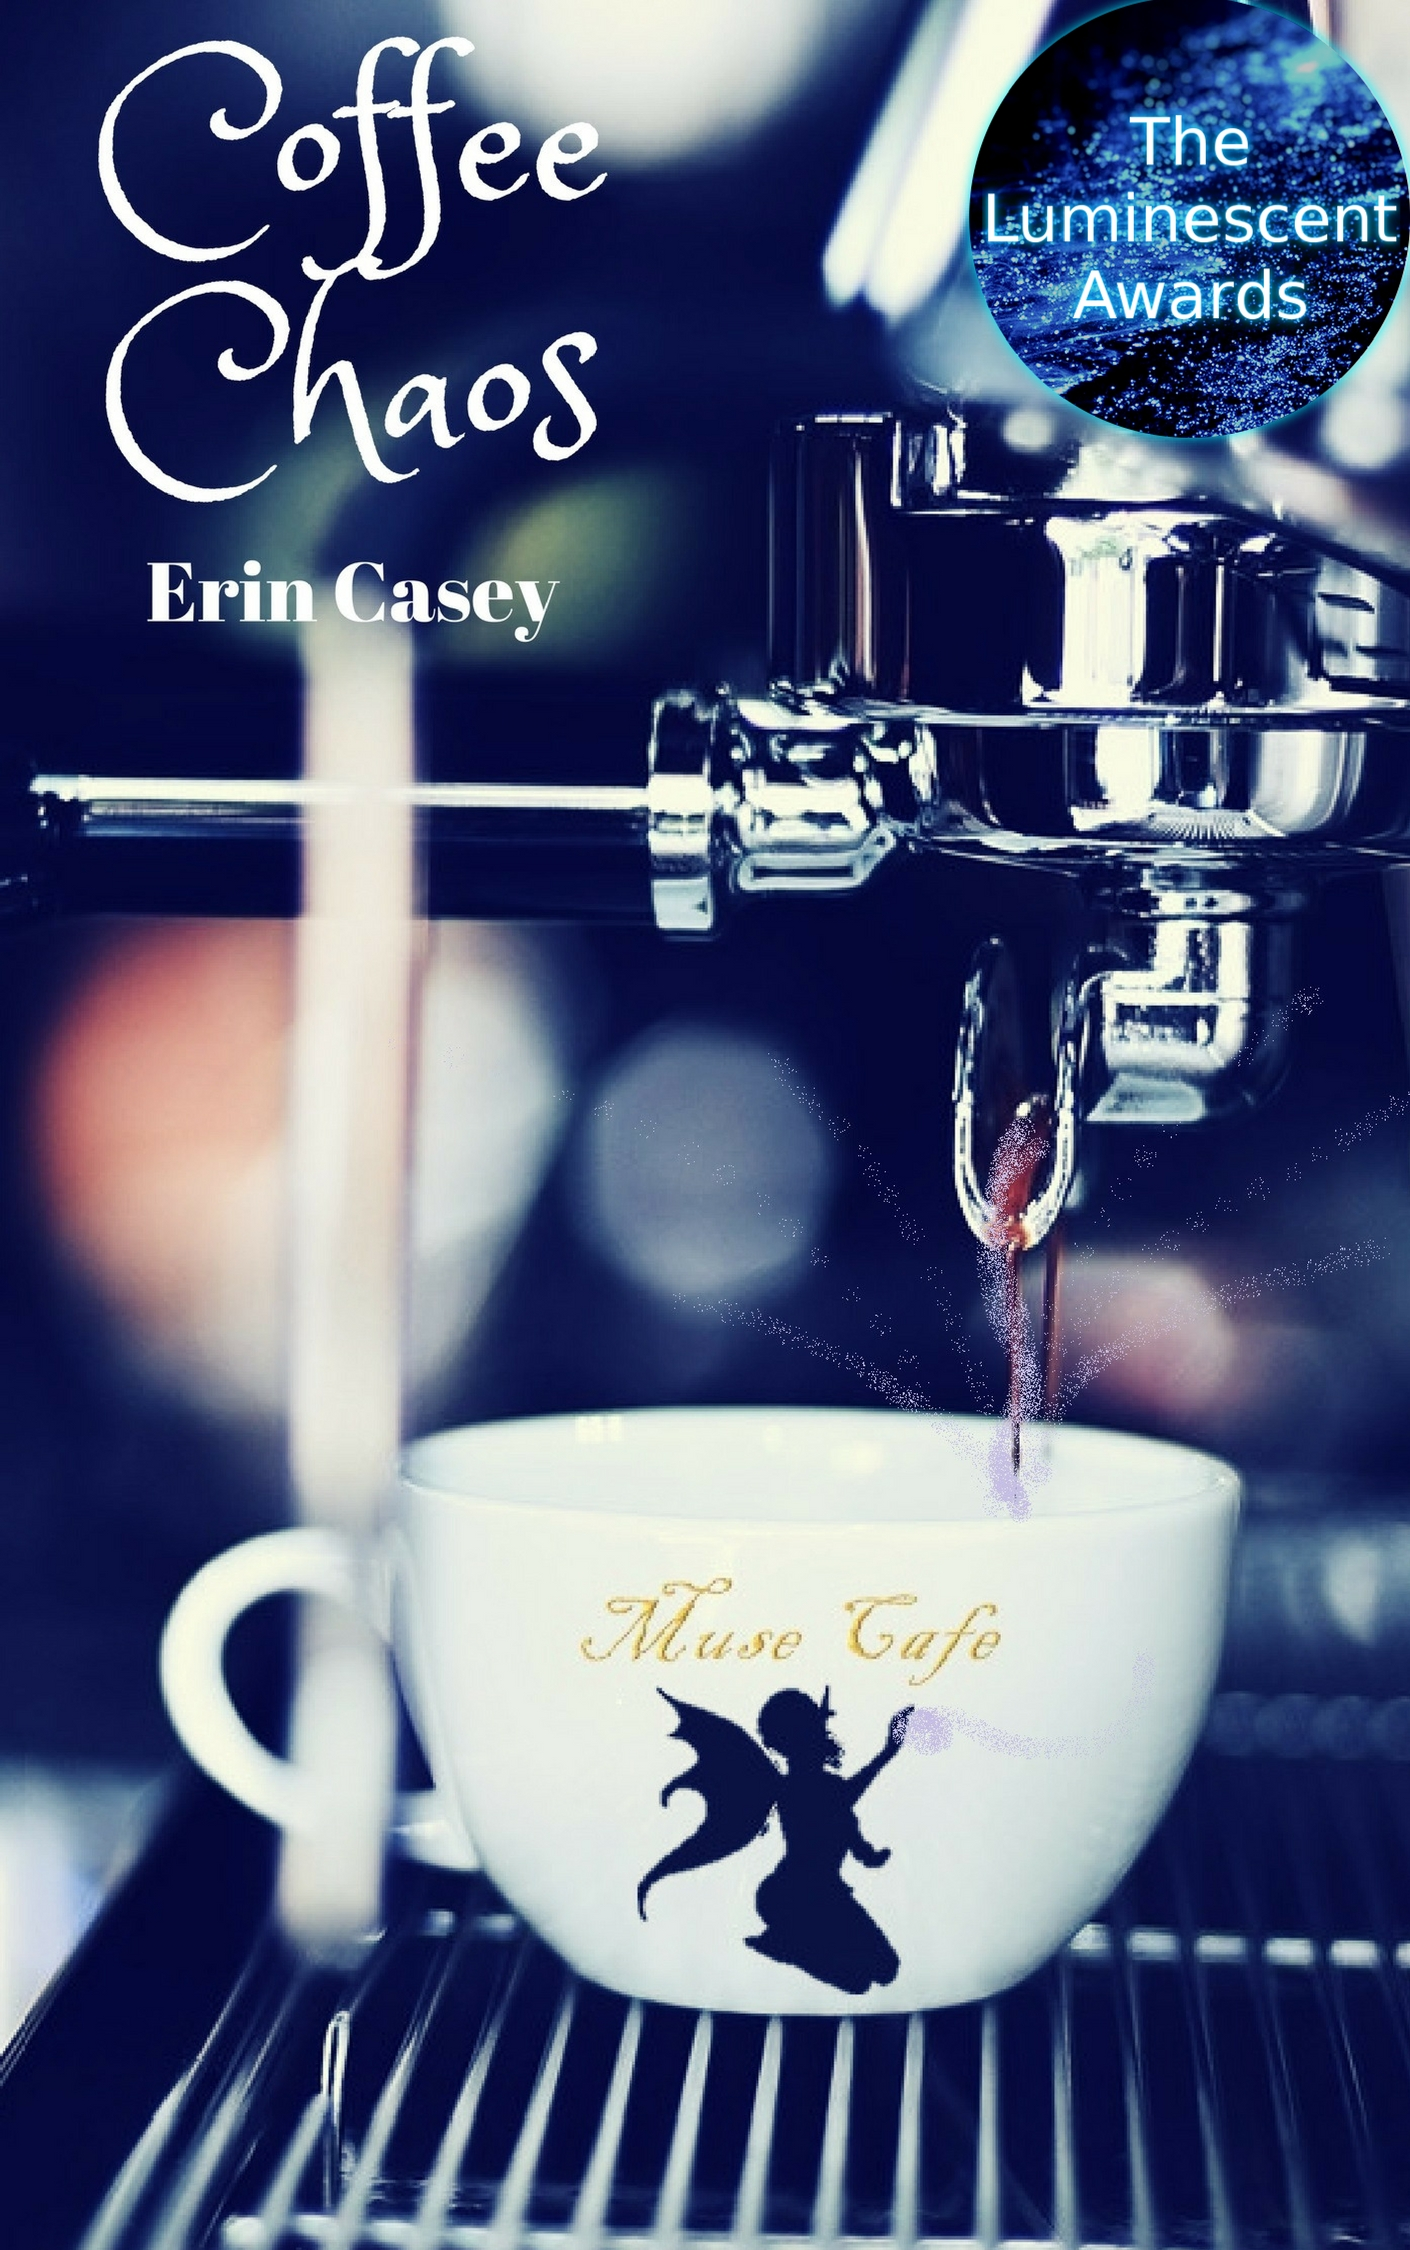 CoffeeChaos3withsticker